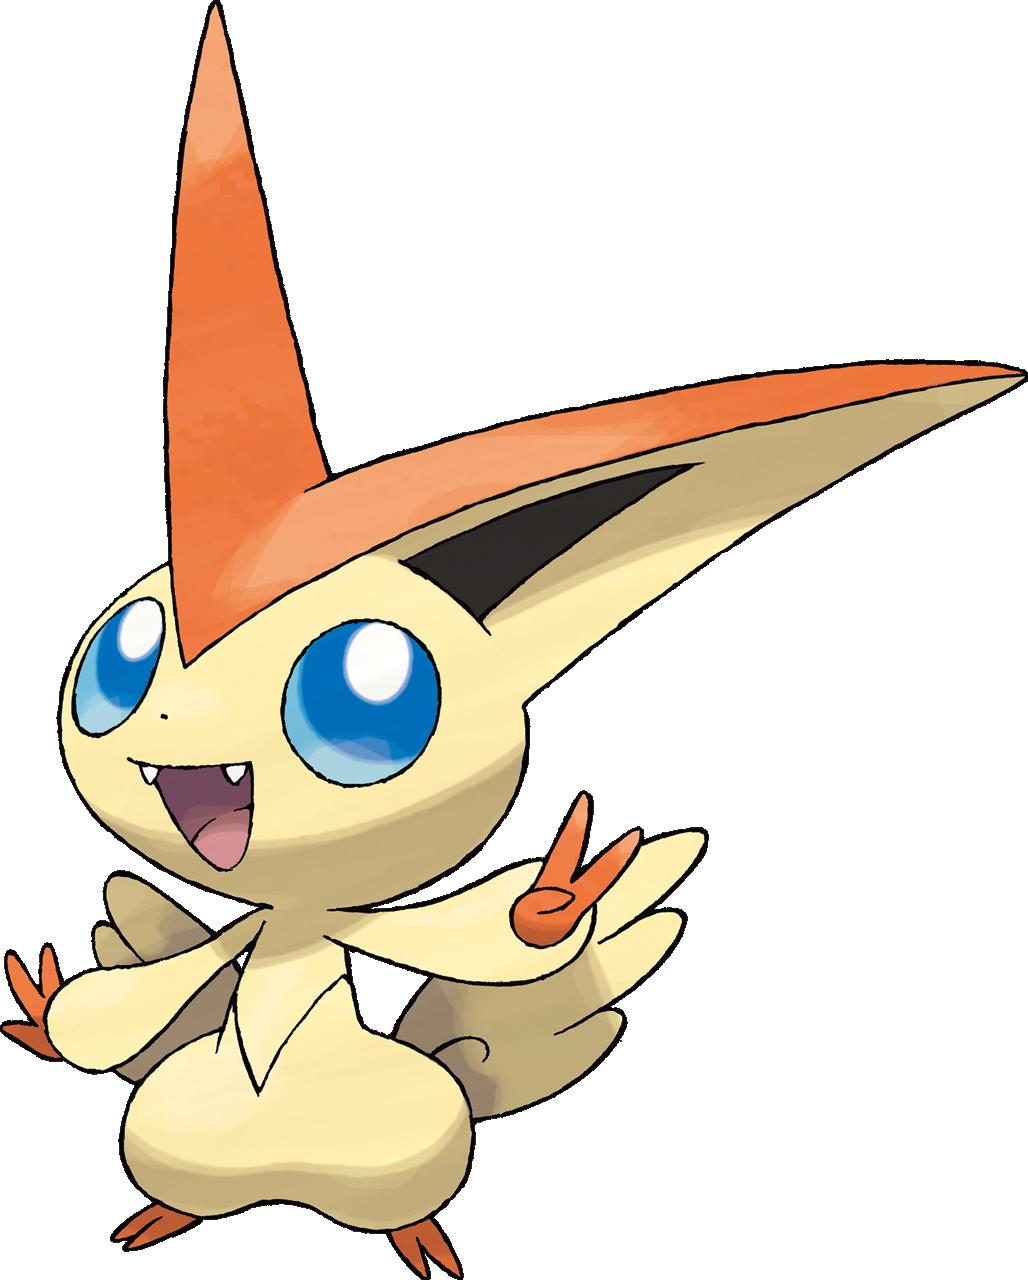 Pokémon GO Datamine 4.09. - Victini Spezialforschung & Texte 4